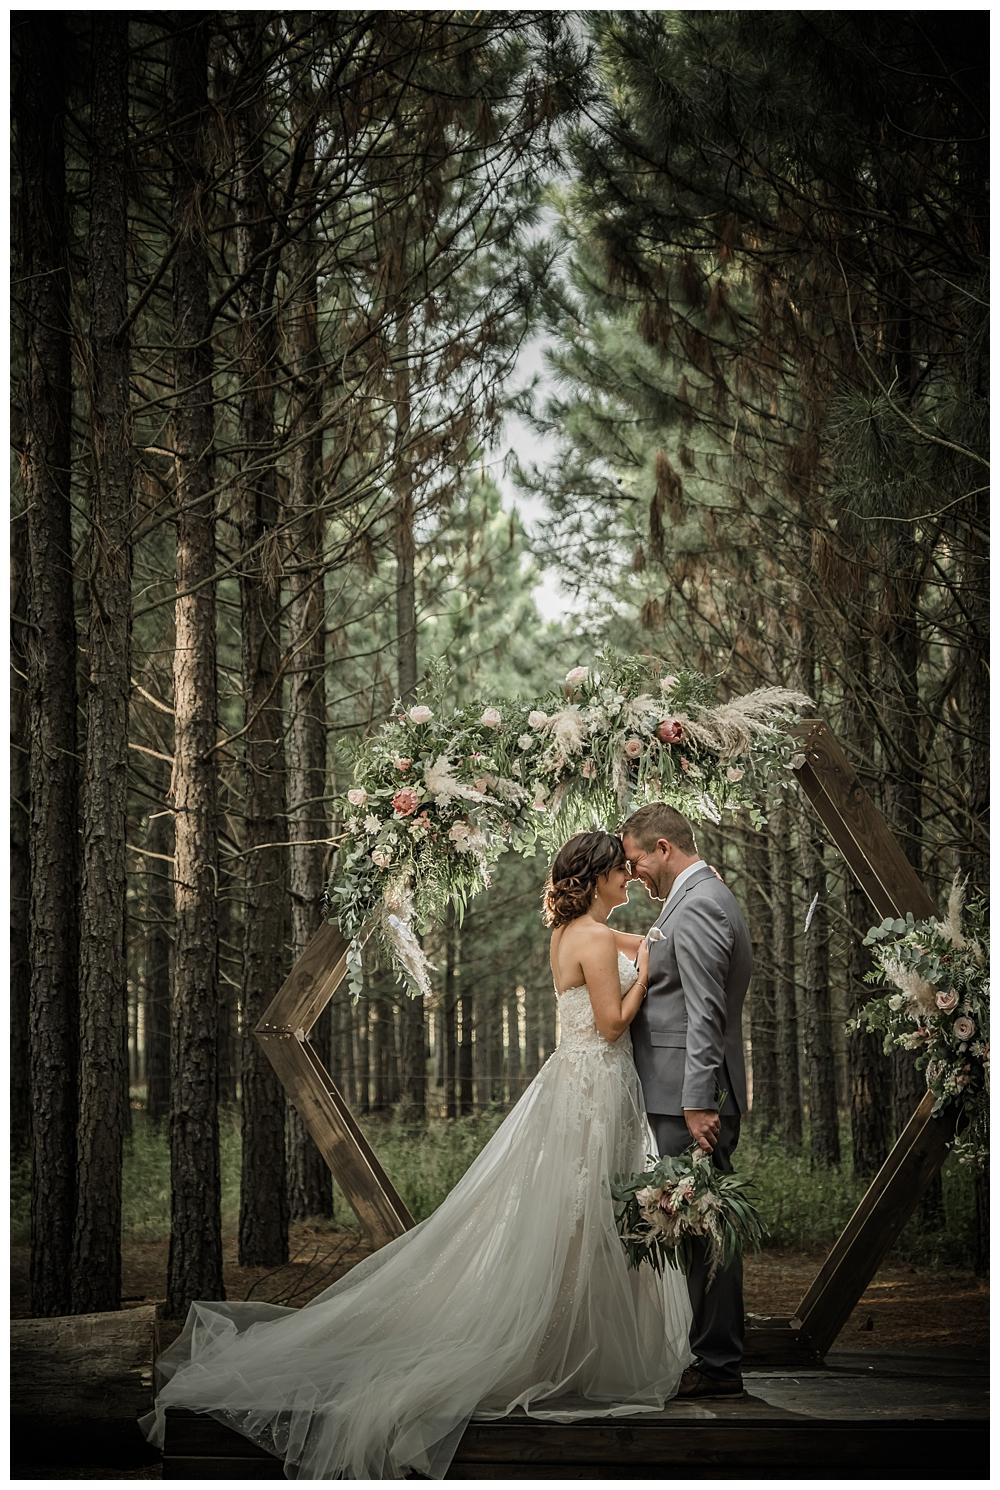 Best_Wedding_Photographer_AlexanderSmith_1170.jpg